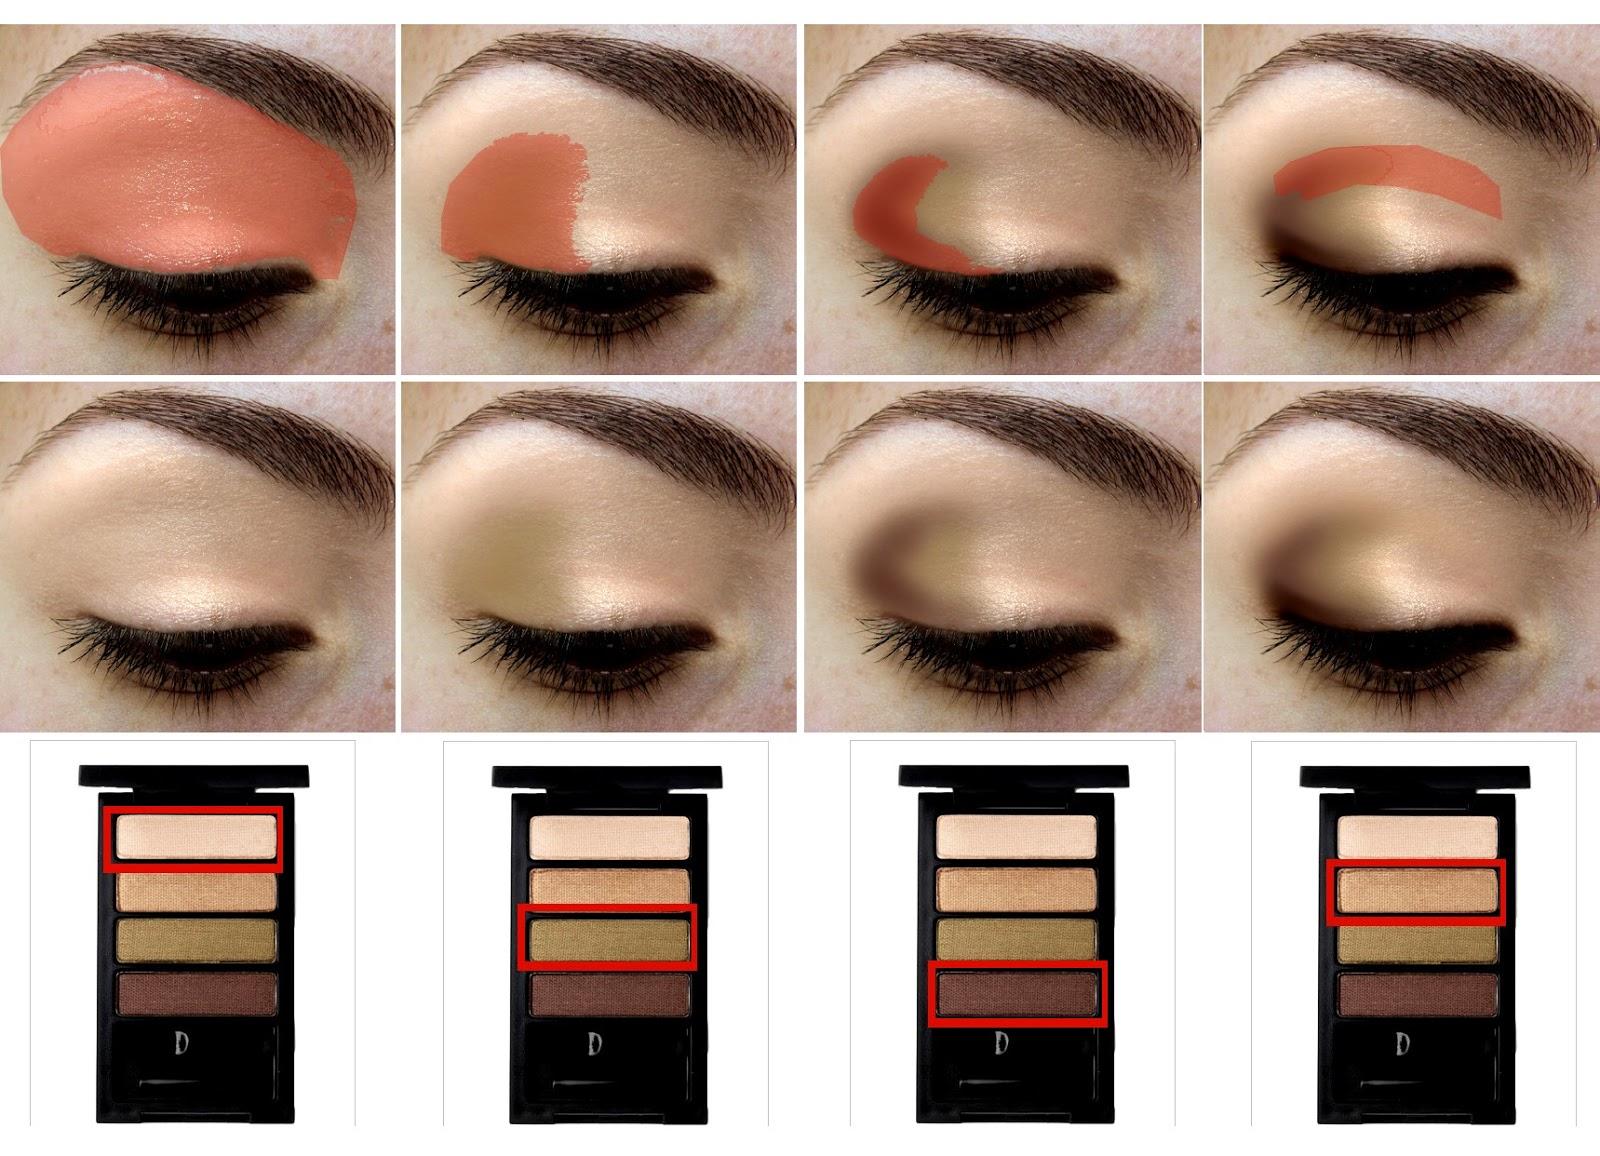 how to put on proper makeup